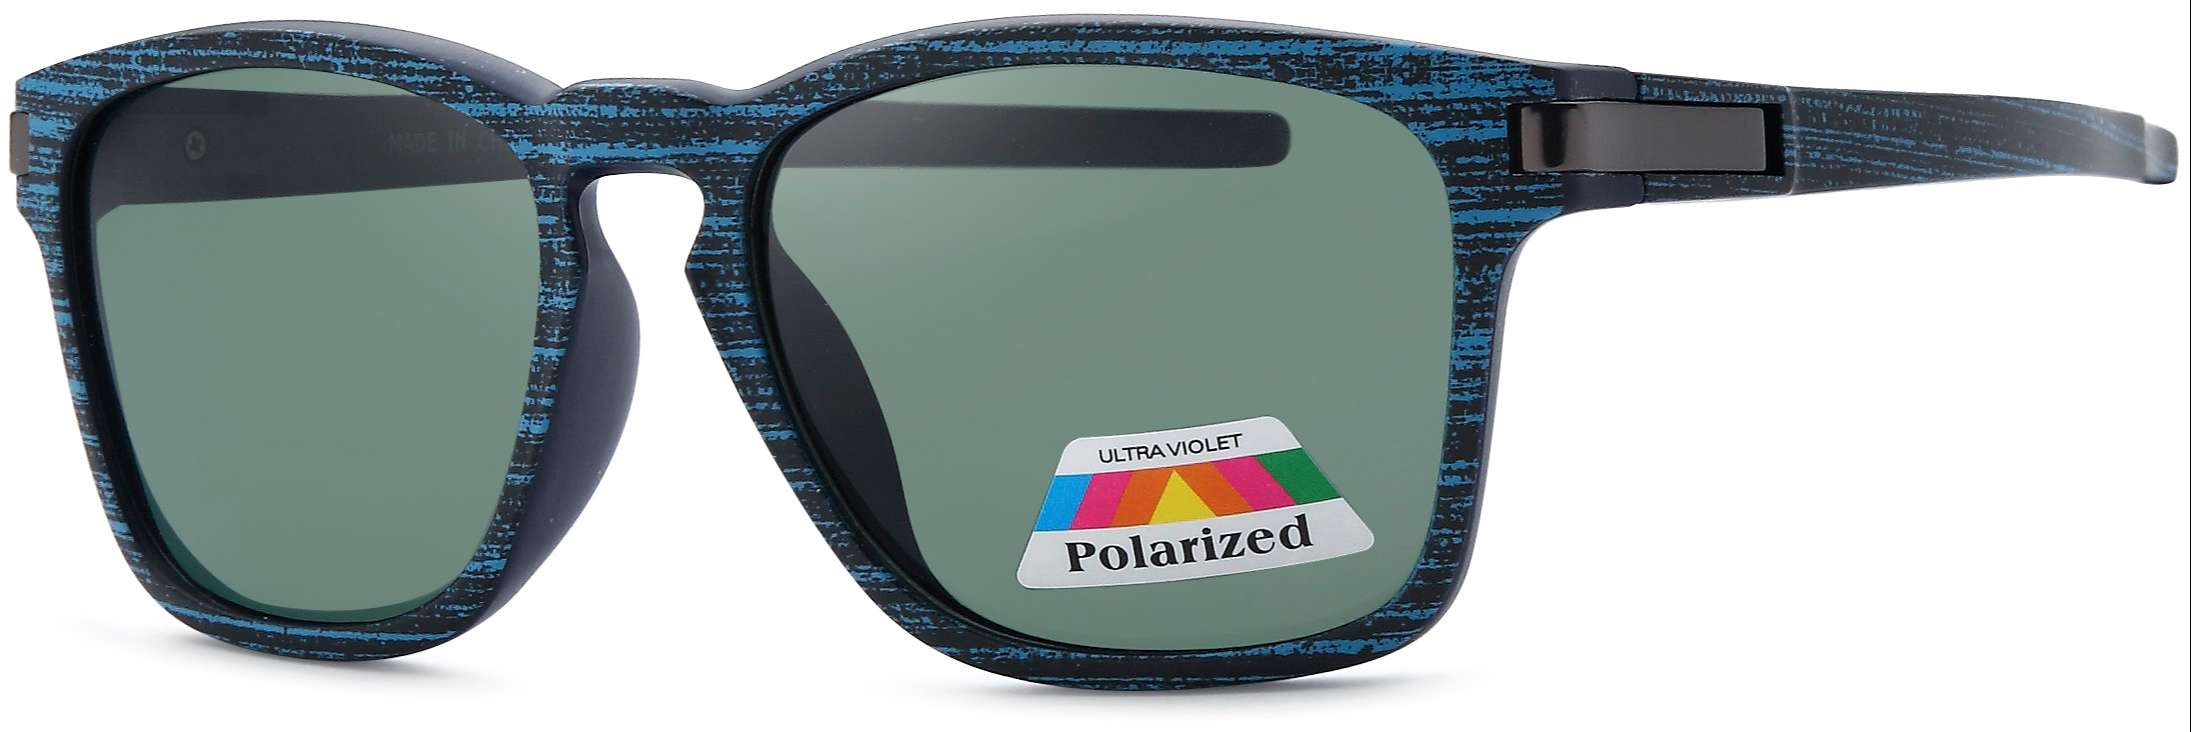 copacabana polarized sunglasses